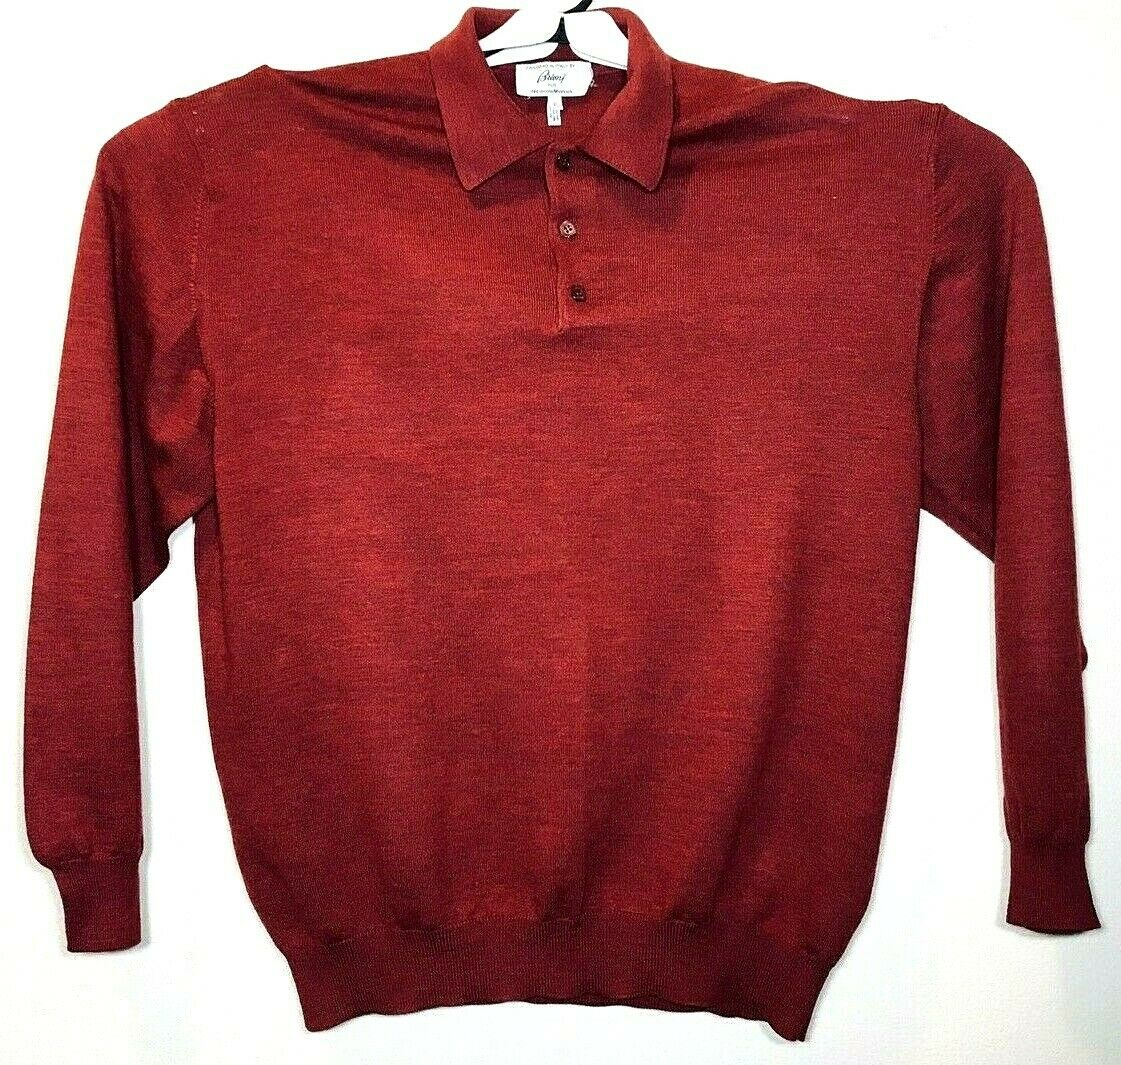 Brioni for Neiman Marcus Mens Burgundy 100% Wool Polo Knit Sweater Shirt Sz XL